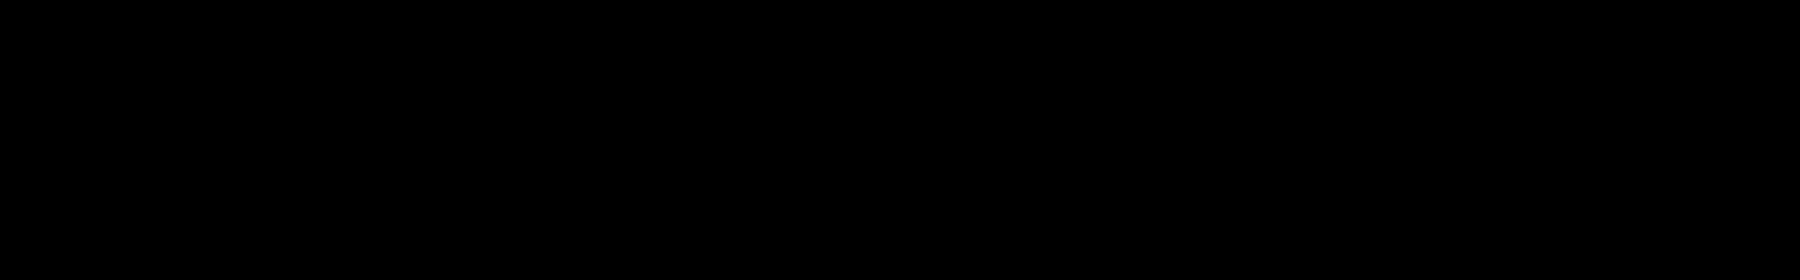 Cinematic Electronics audio waveform